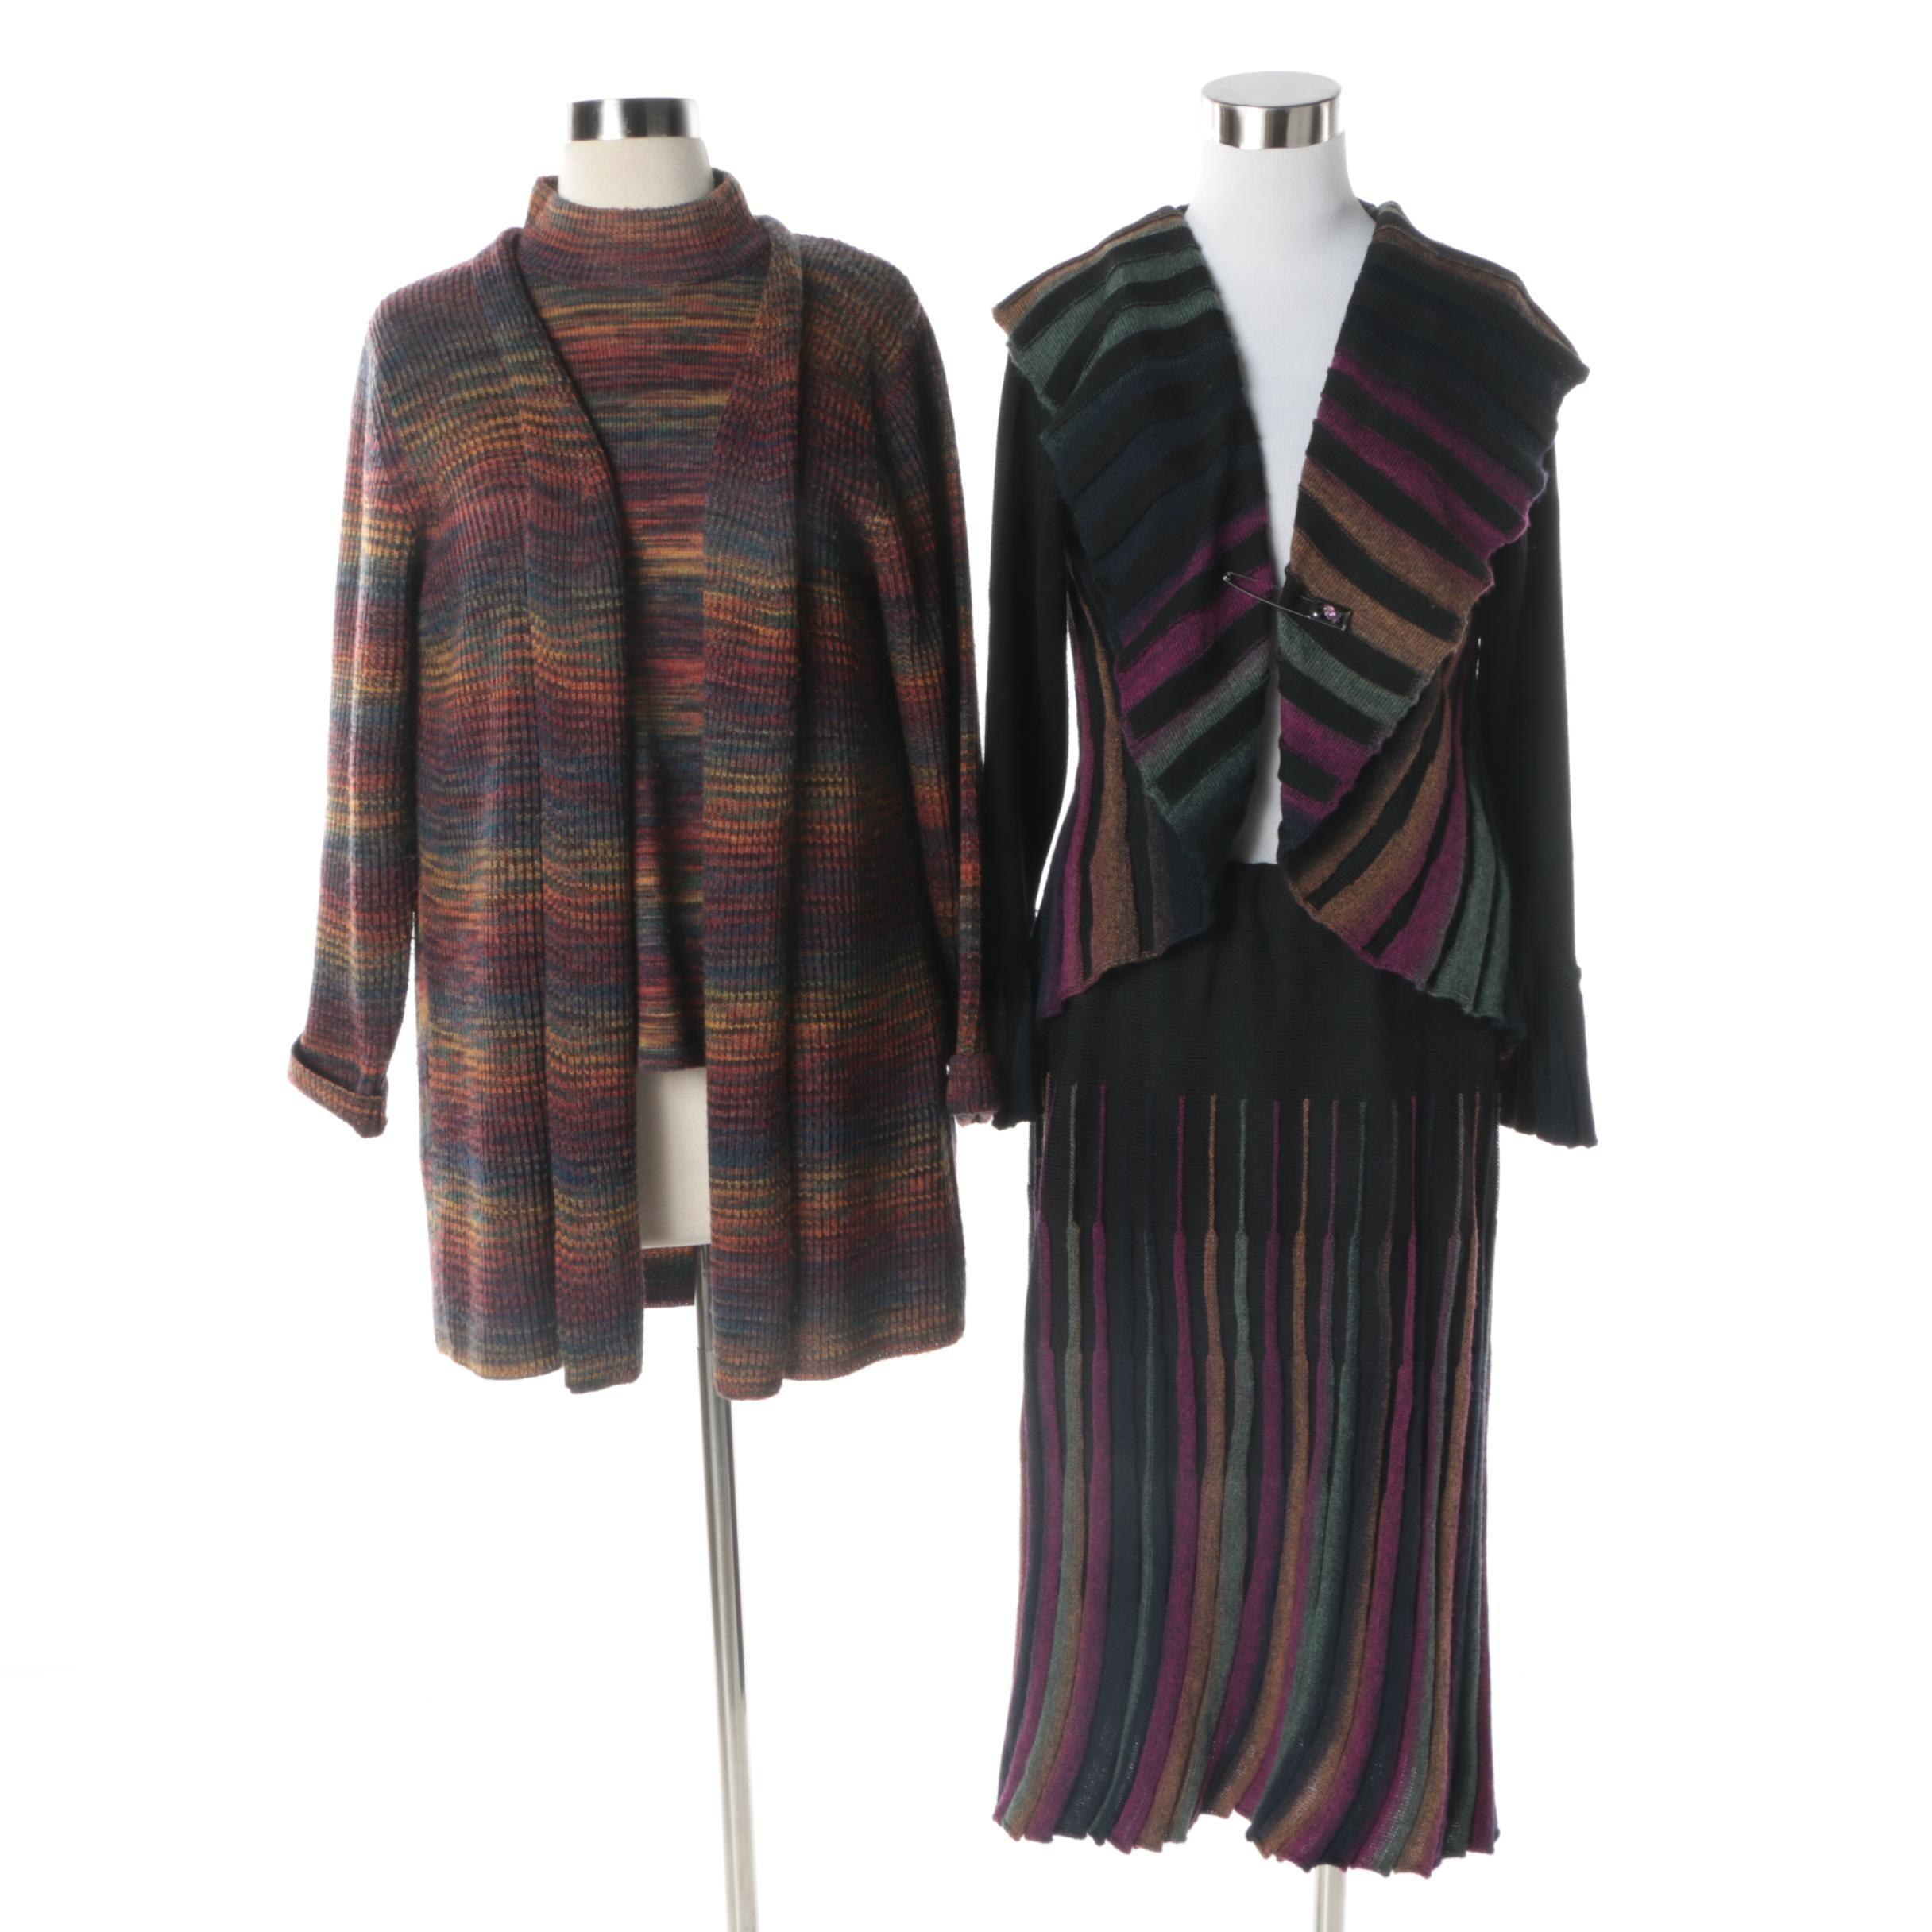 Women's Knit Sets Including Colette Mordo for Sadimara